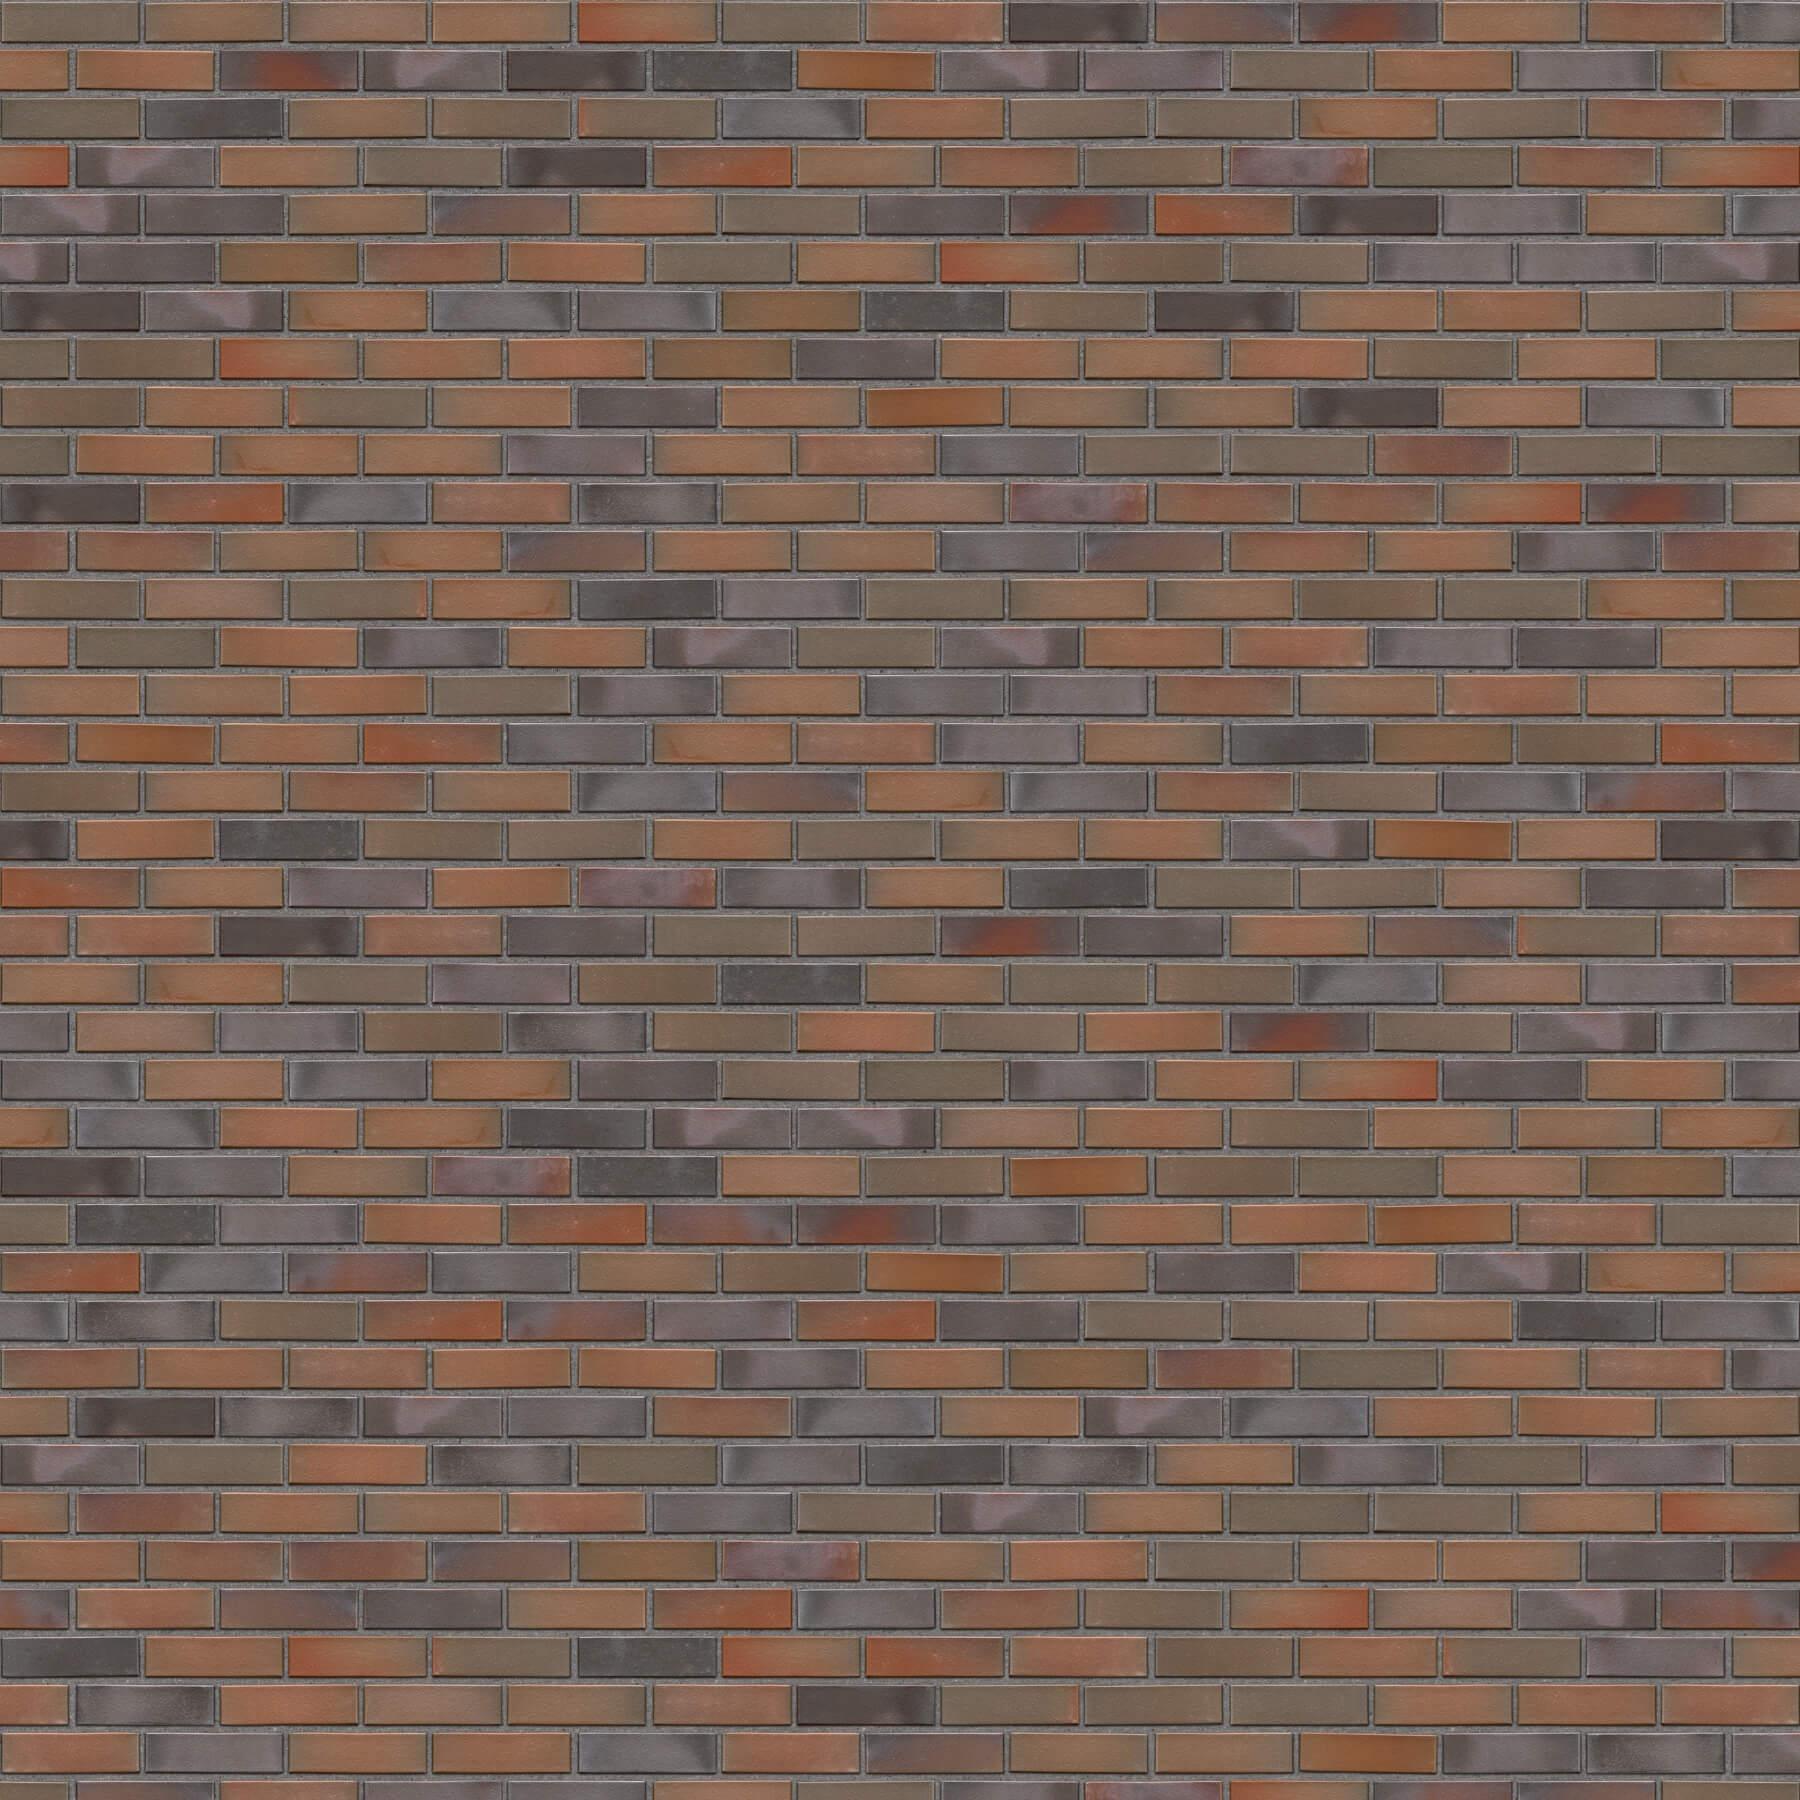 Puna-cigla-FeldHaus-Klinker-brick-house-Beograd-nf-k-350-SIva Fuga